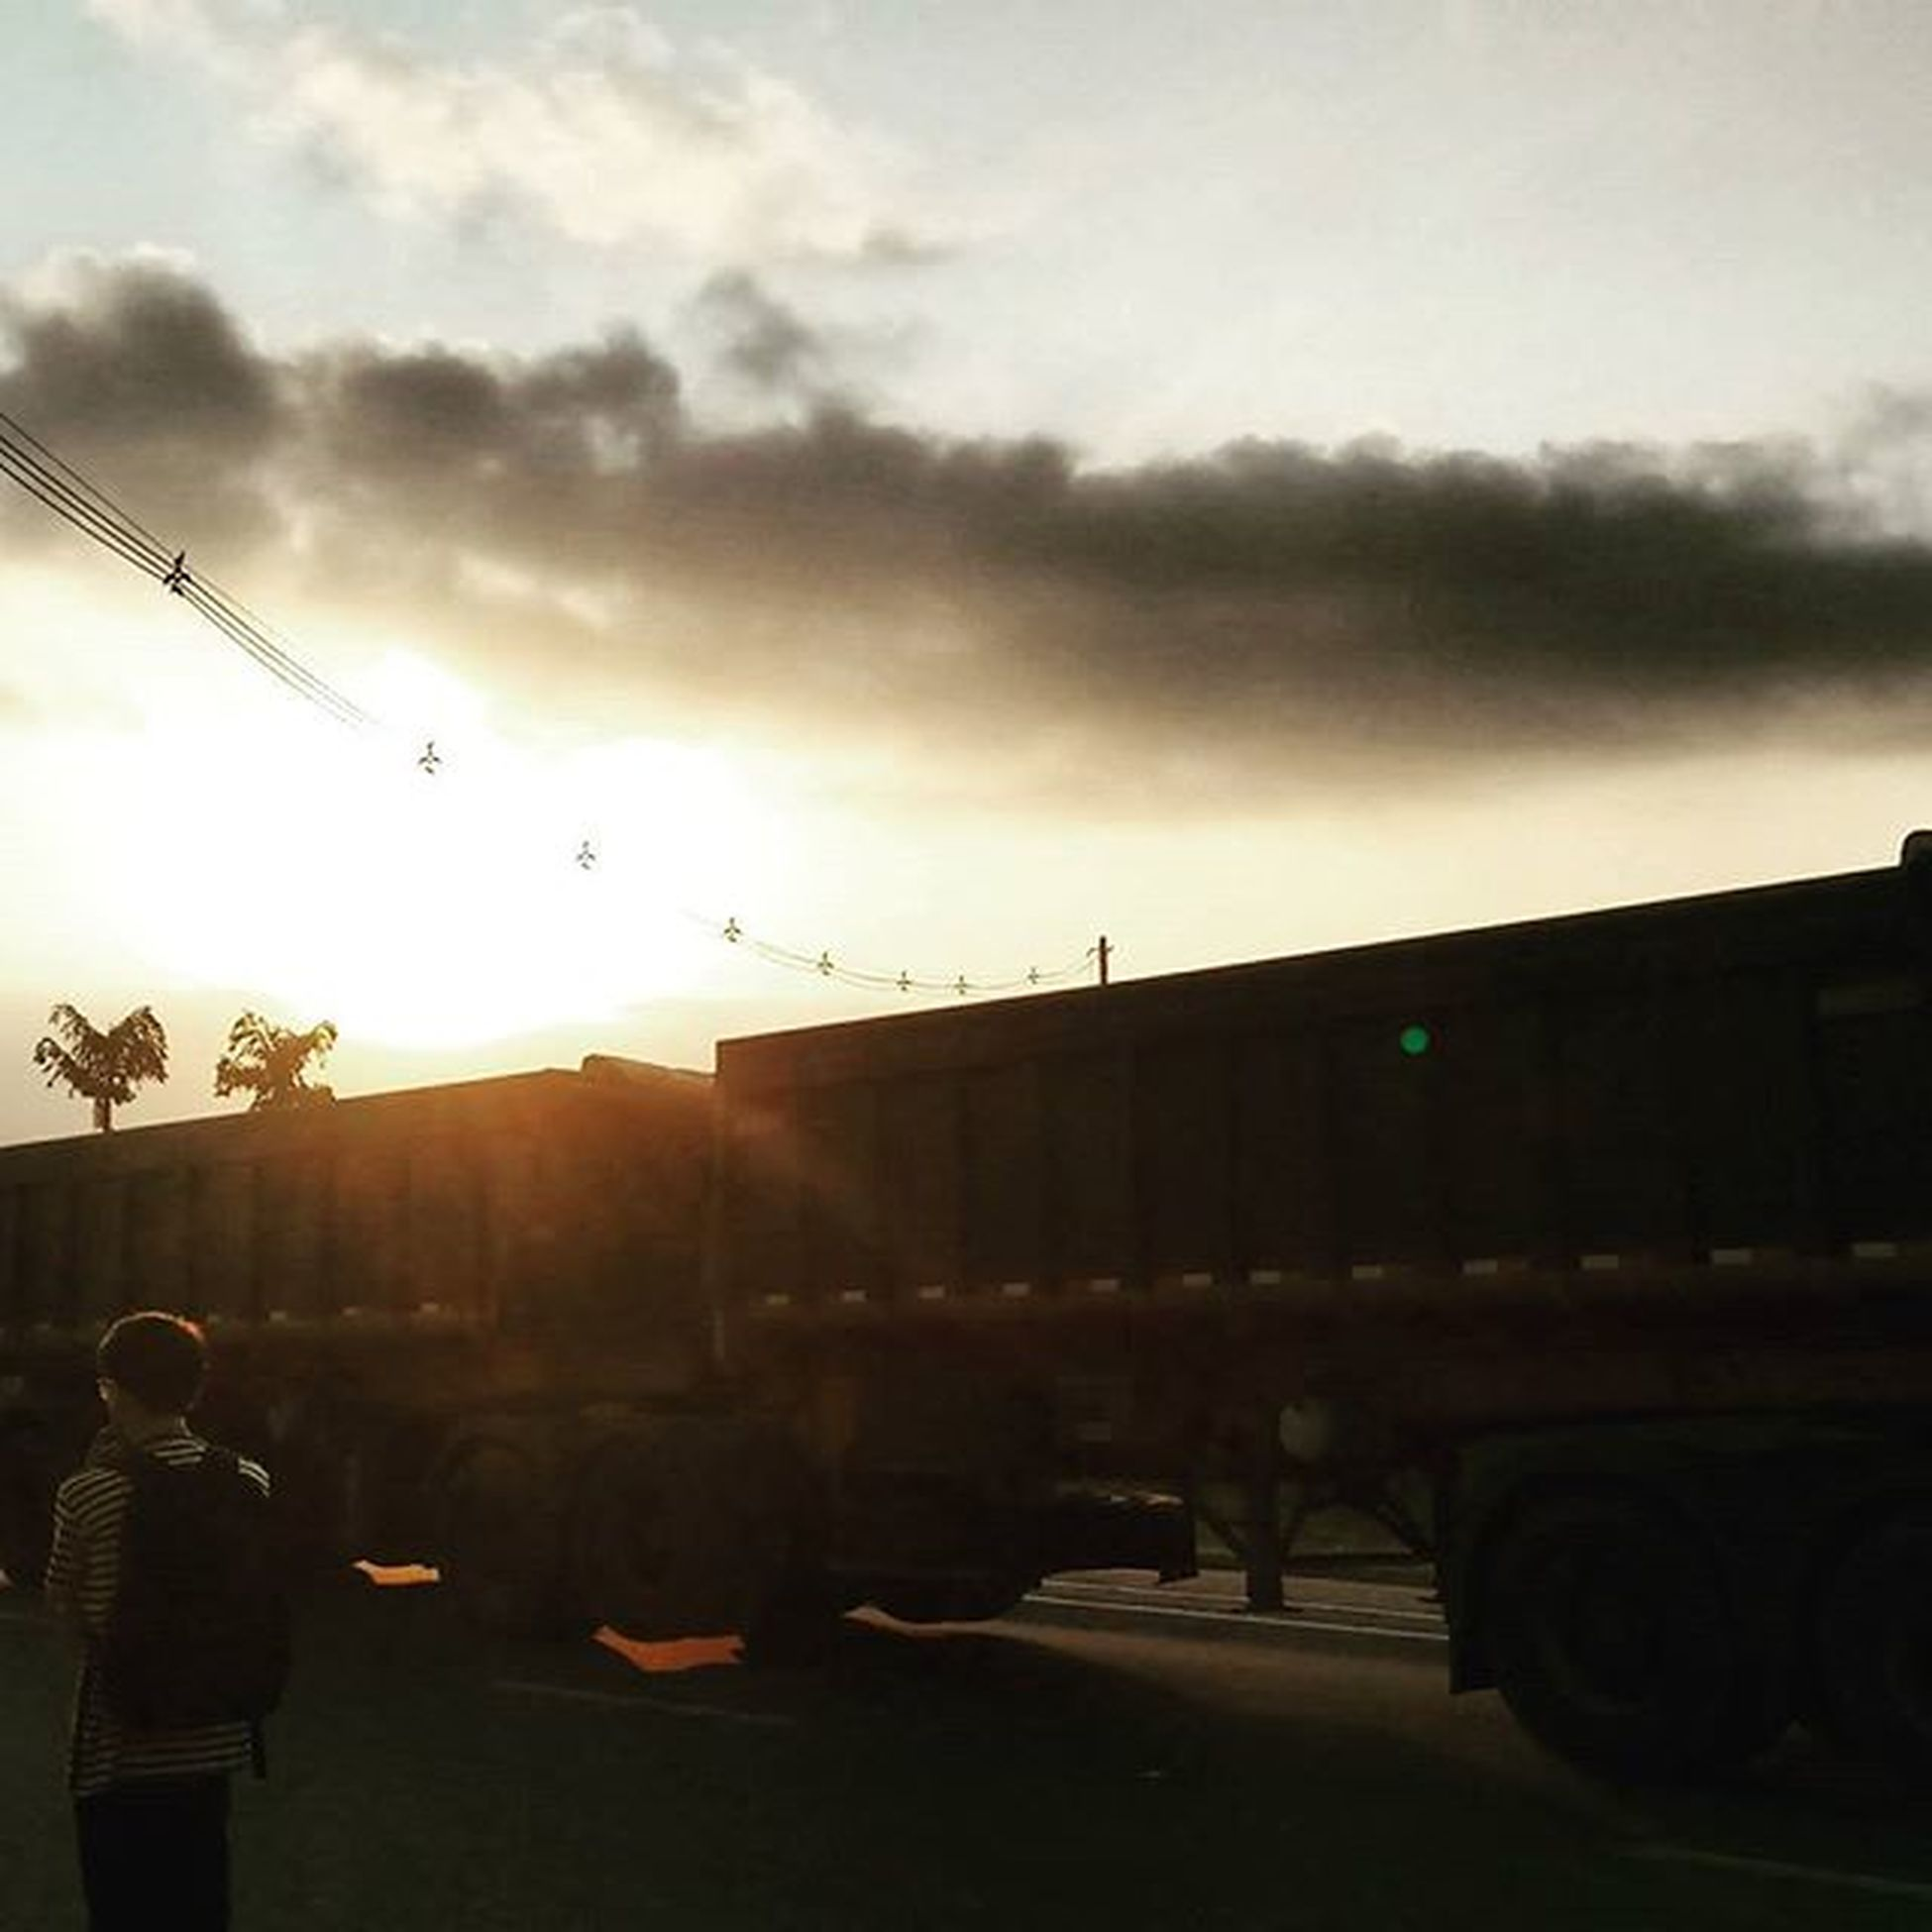 17h10 Instaphoto Instatruck Truck Caminhão Cargapesada Praiagrande Photo Brasil Brazil